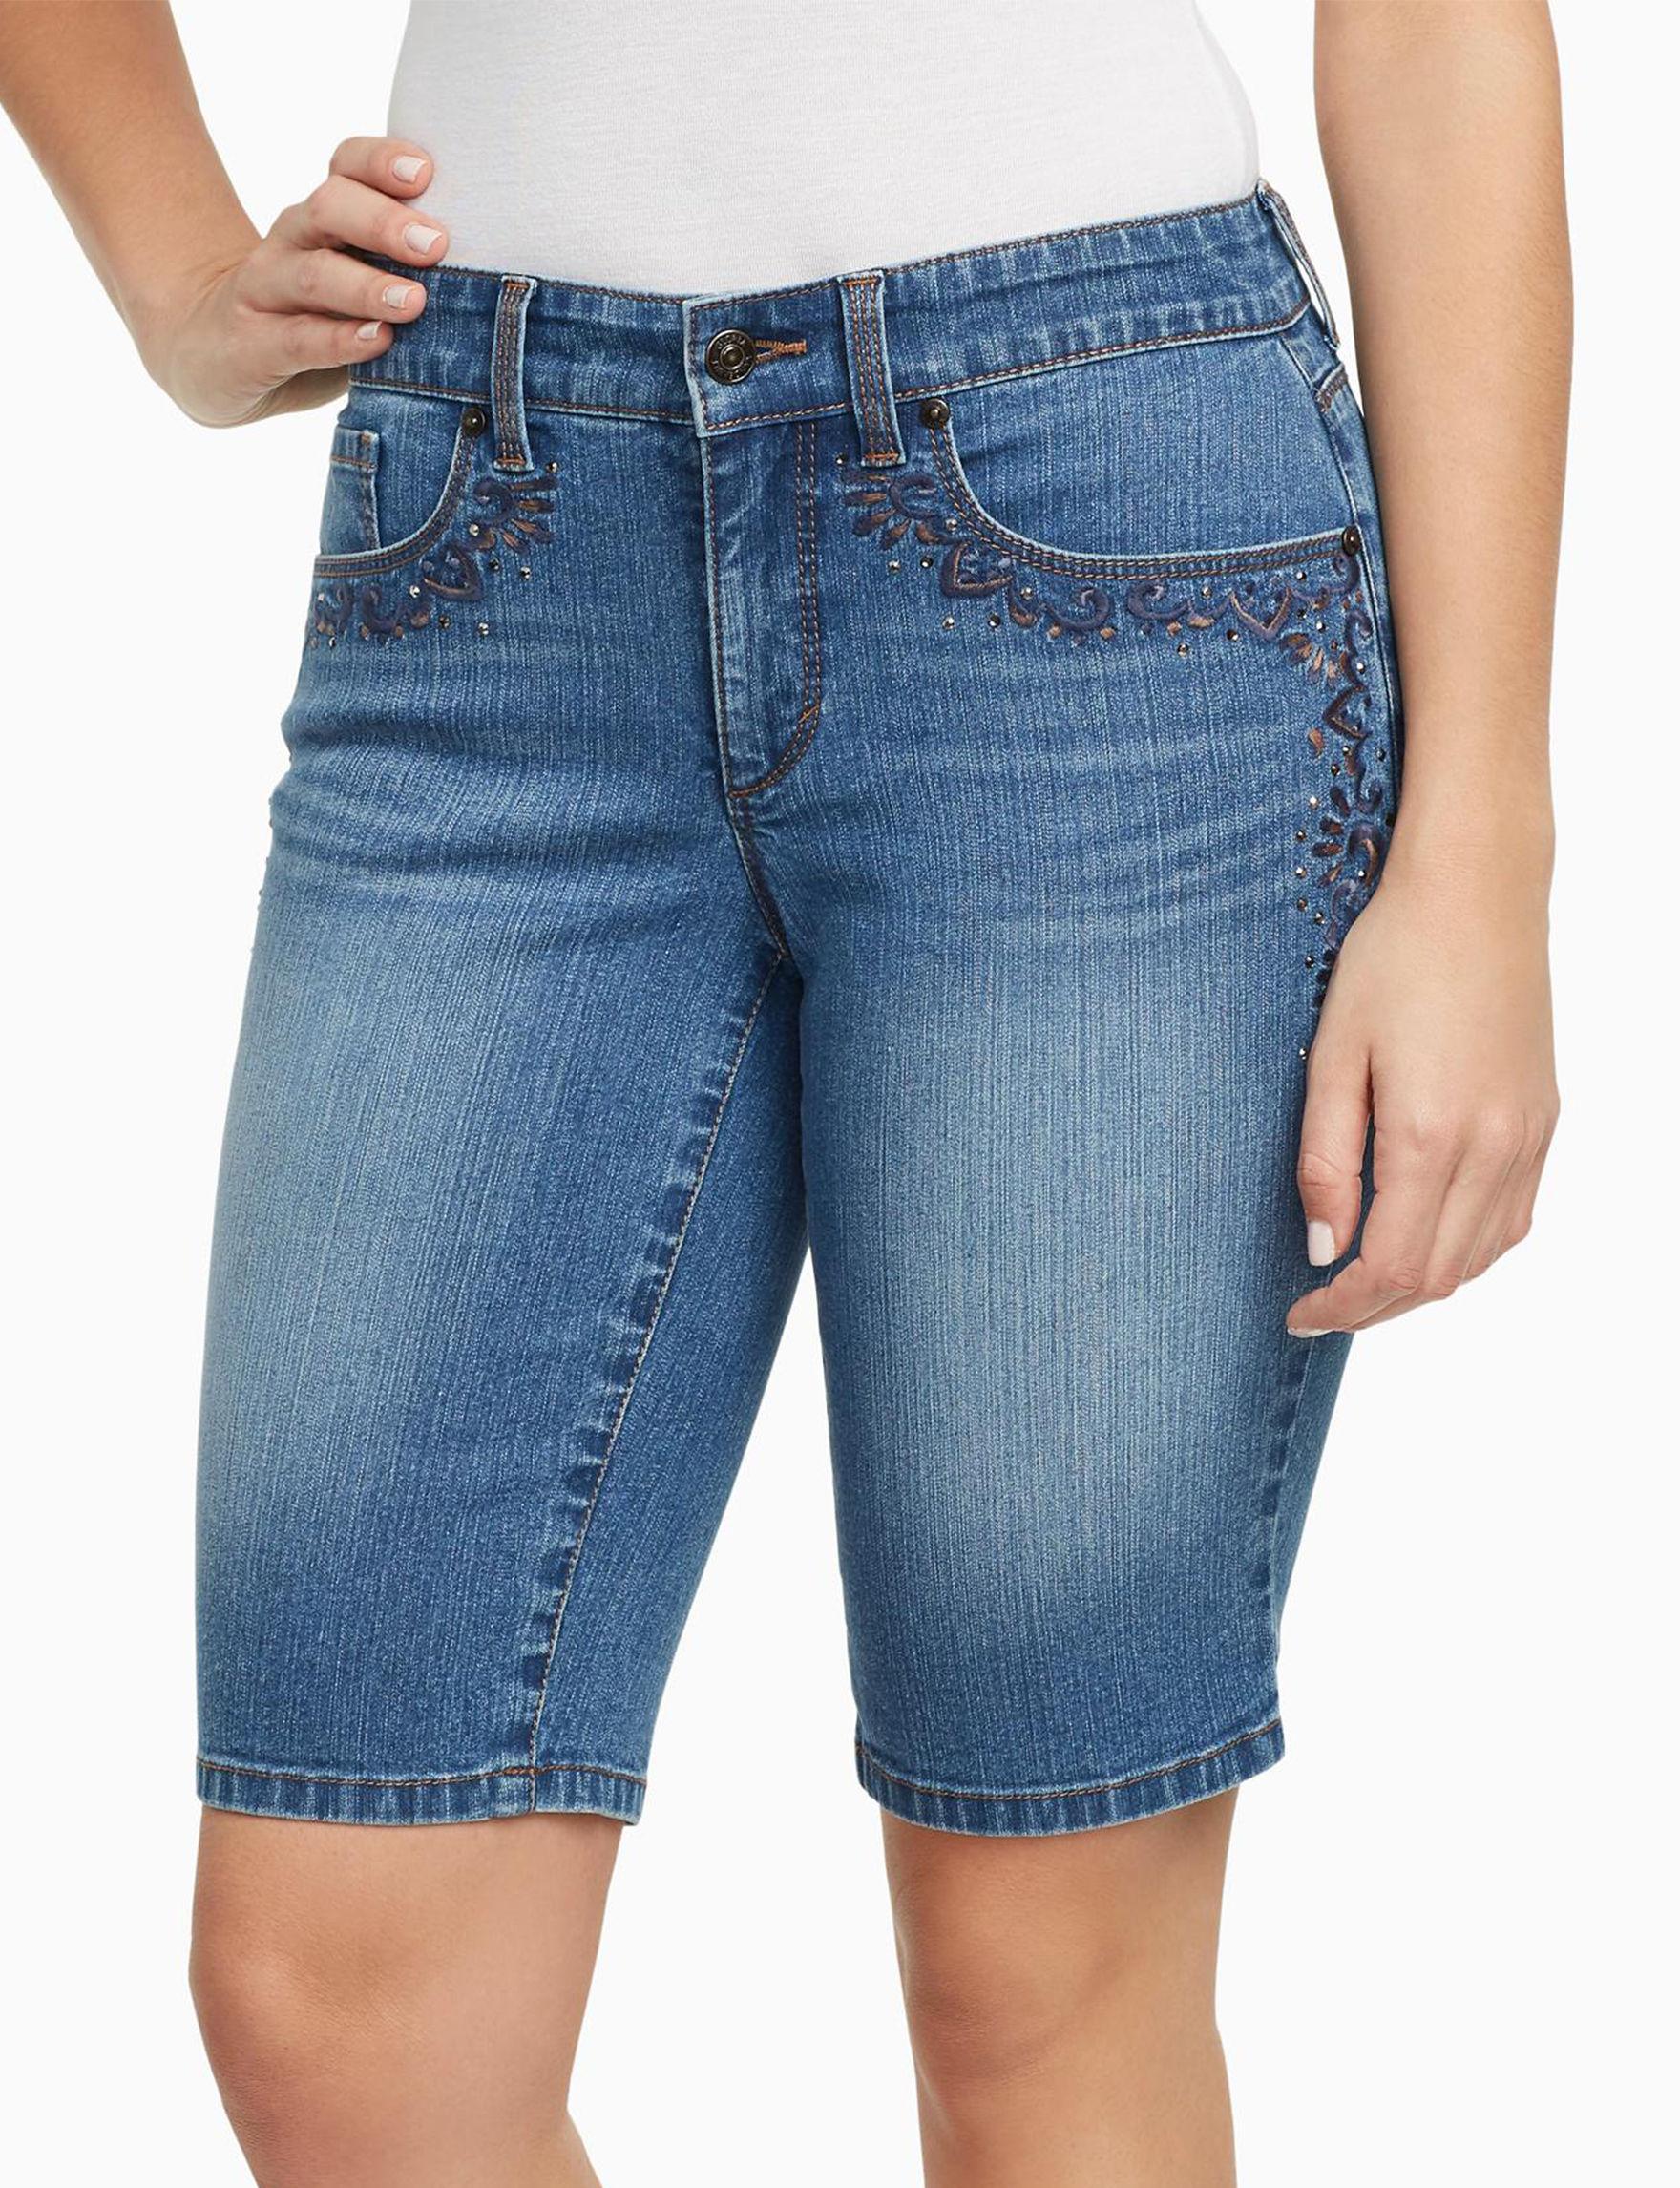 Gloria Vanderbilt Blue Bermudas Denim Shorts